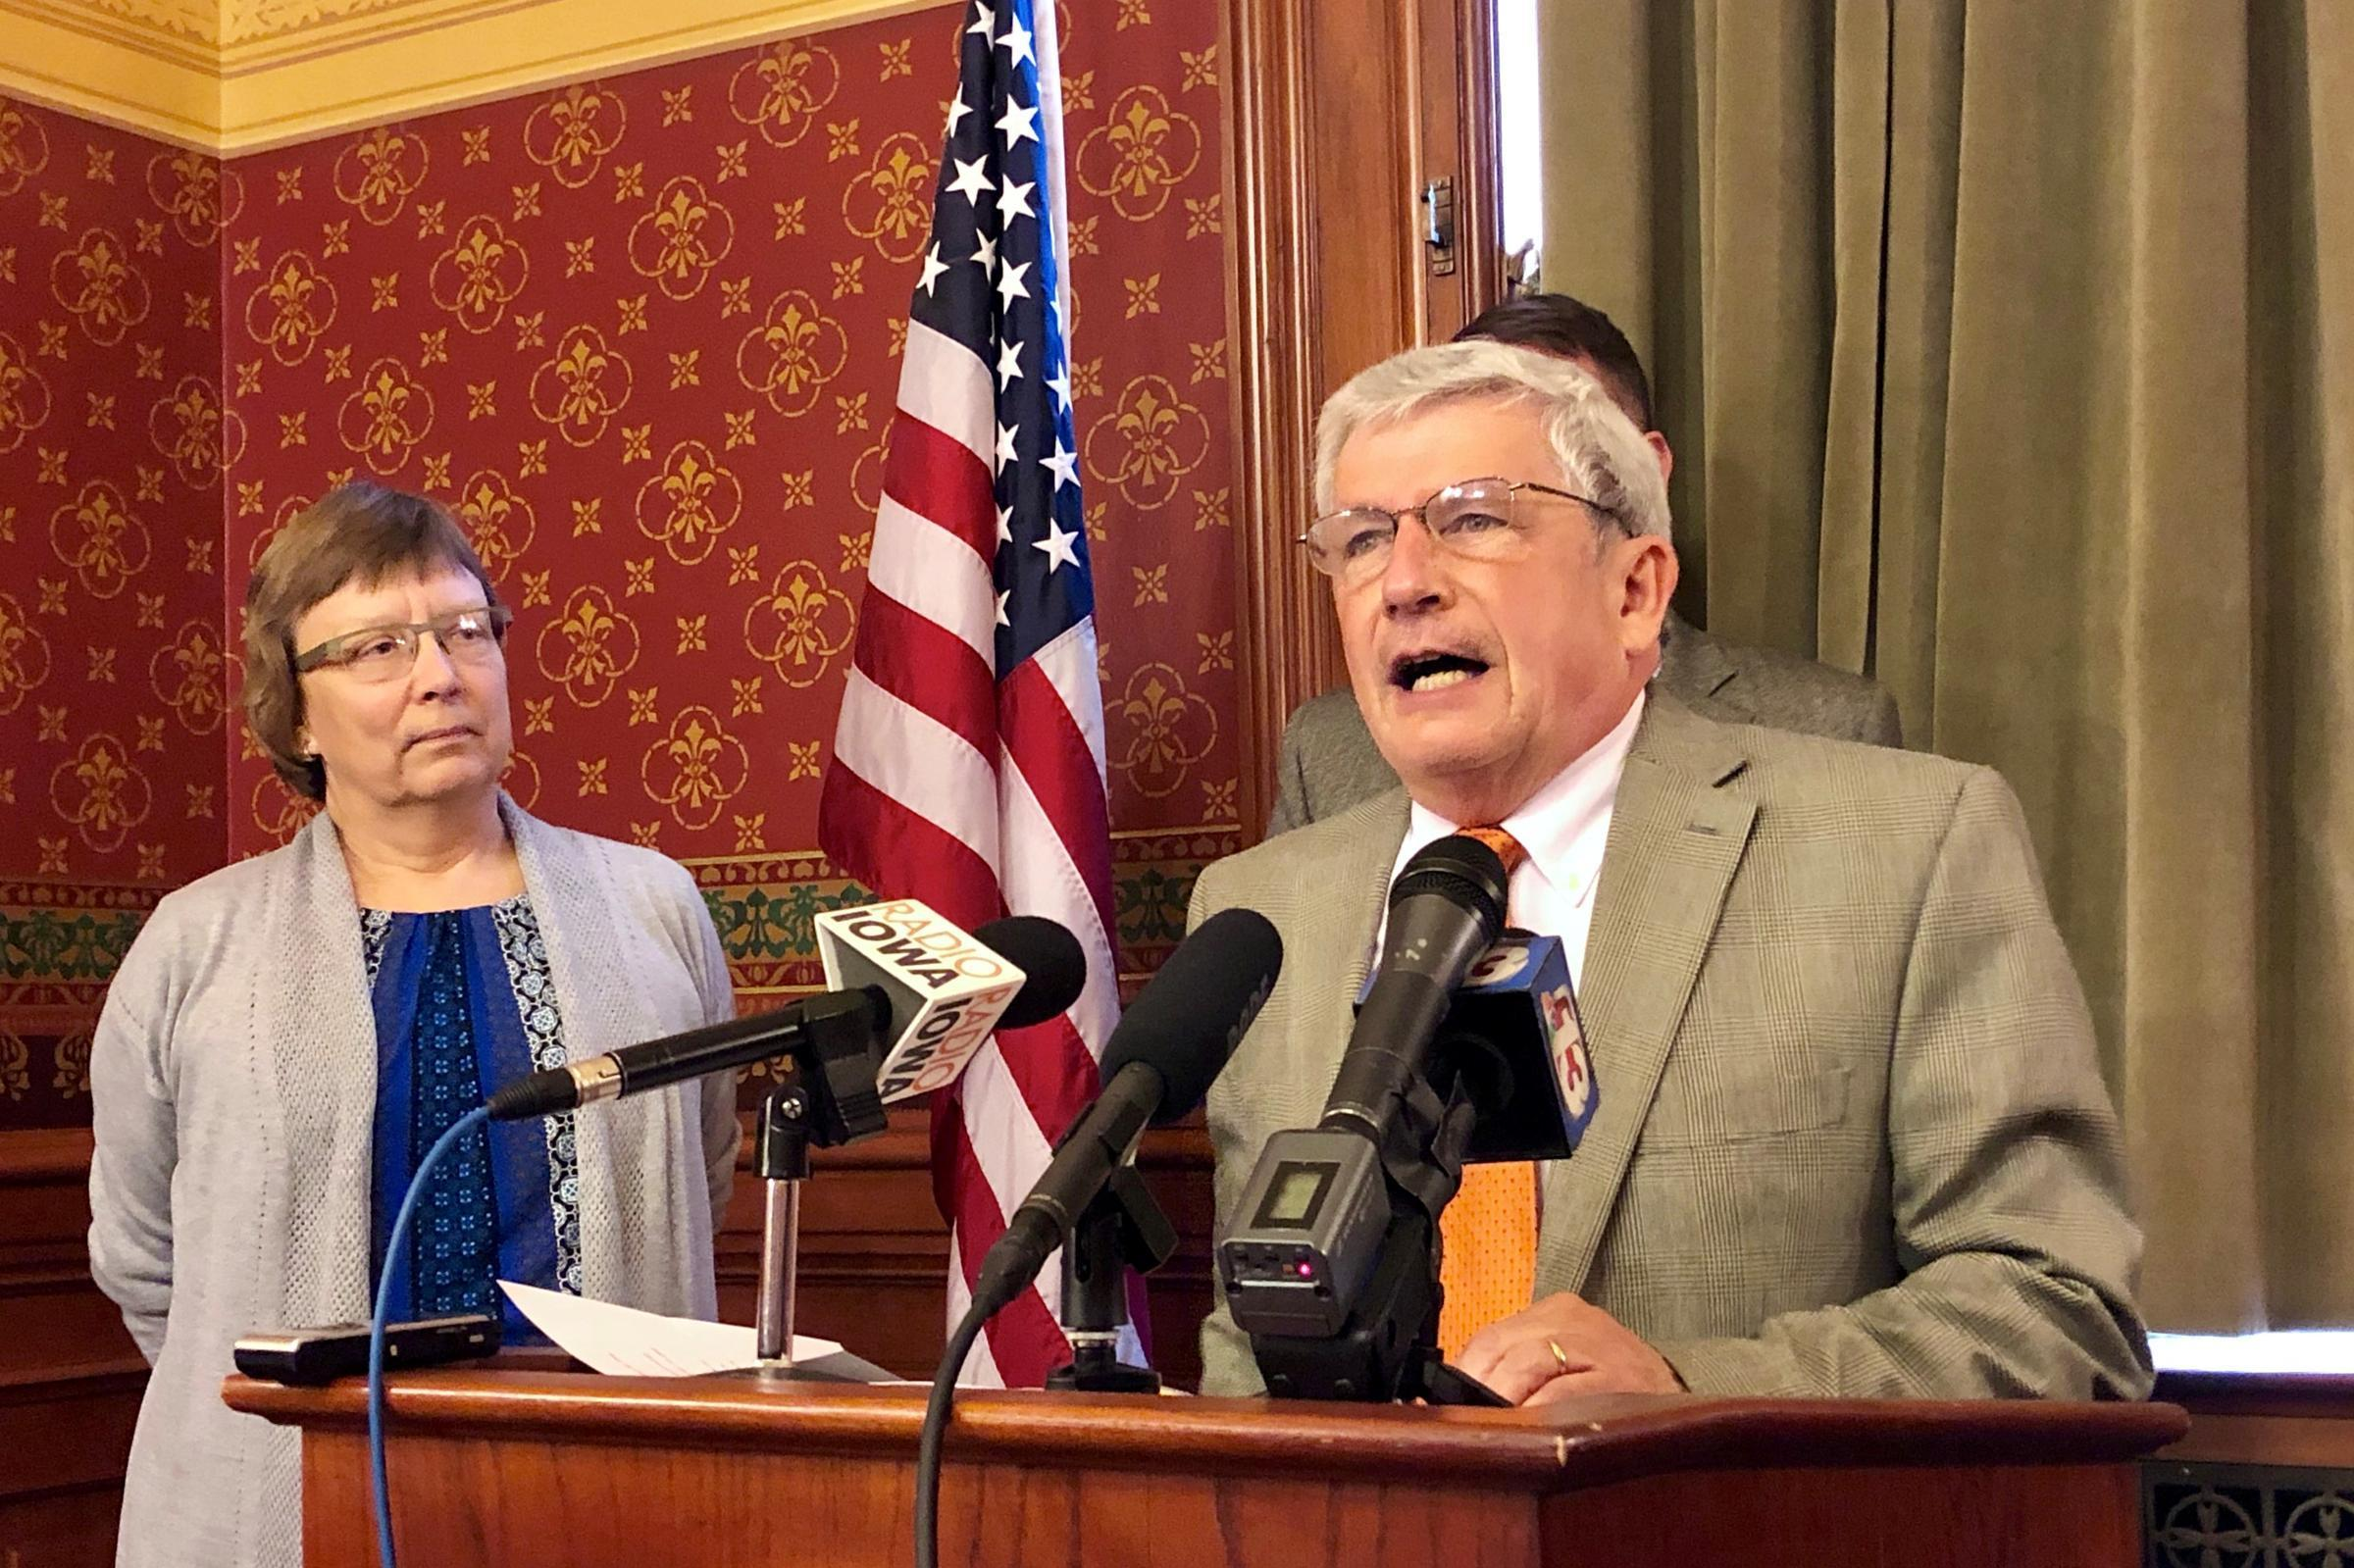 Blasting Trump's 'Unacceptable Behavior,' Iowa Lawmaker Leaves GOP After 40+ Years